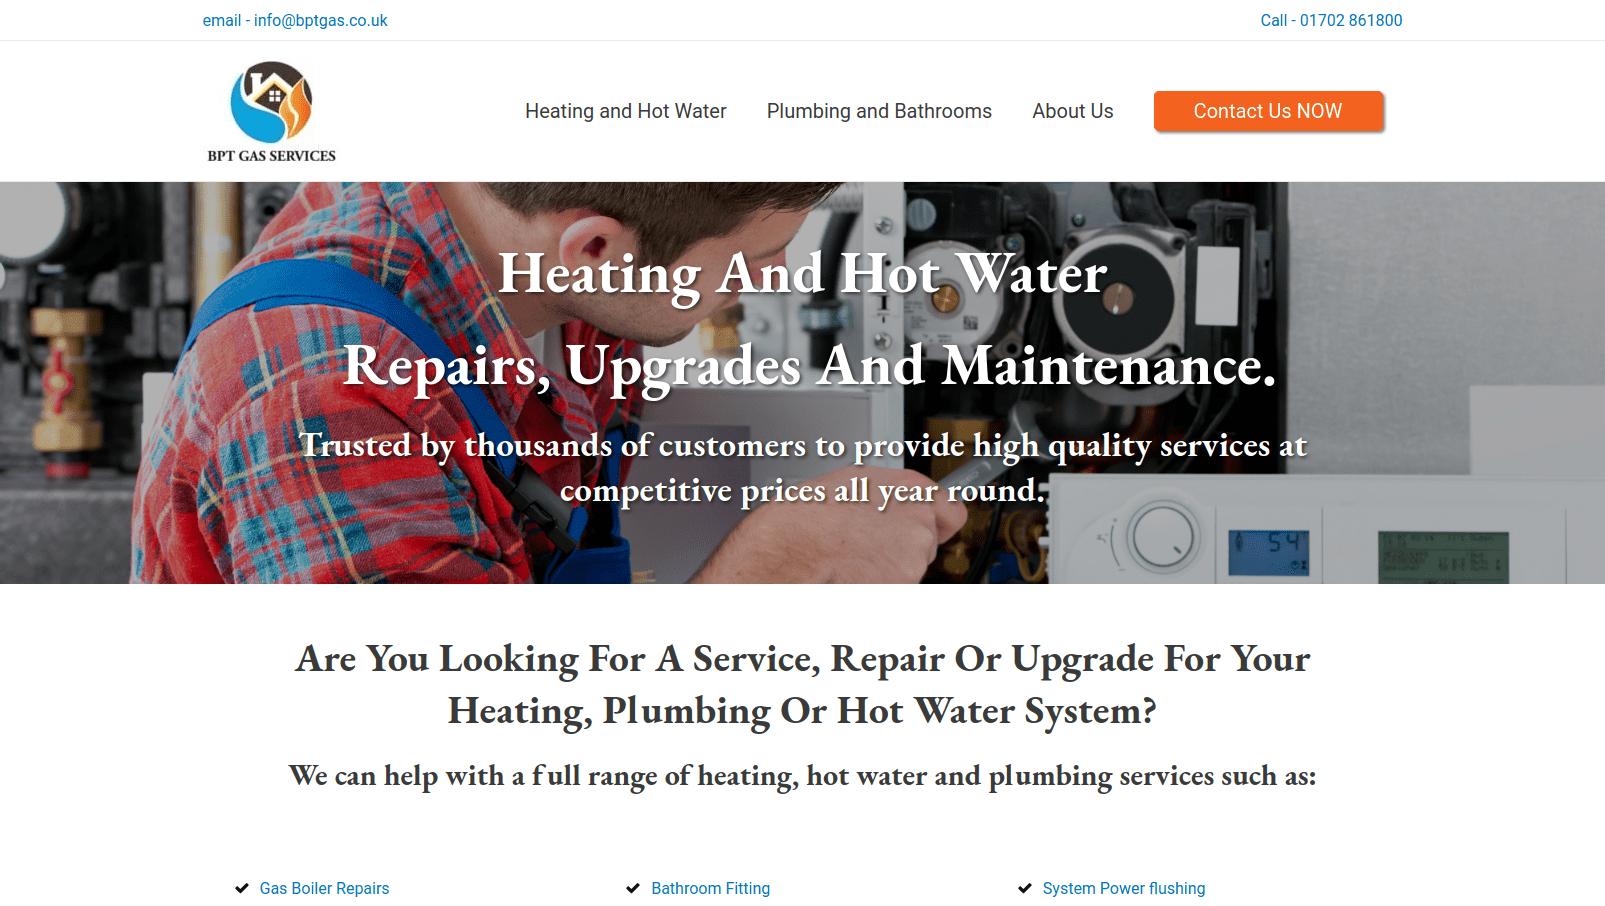 BPT Gas Services website